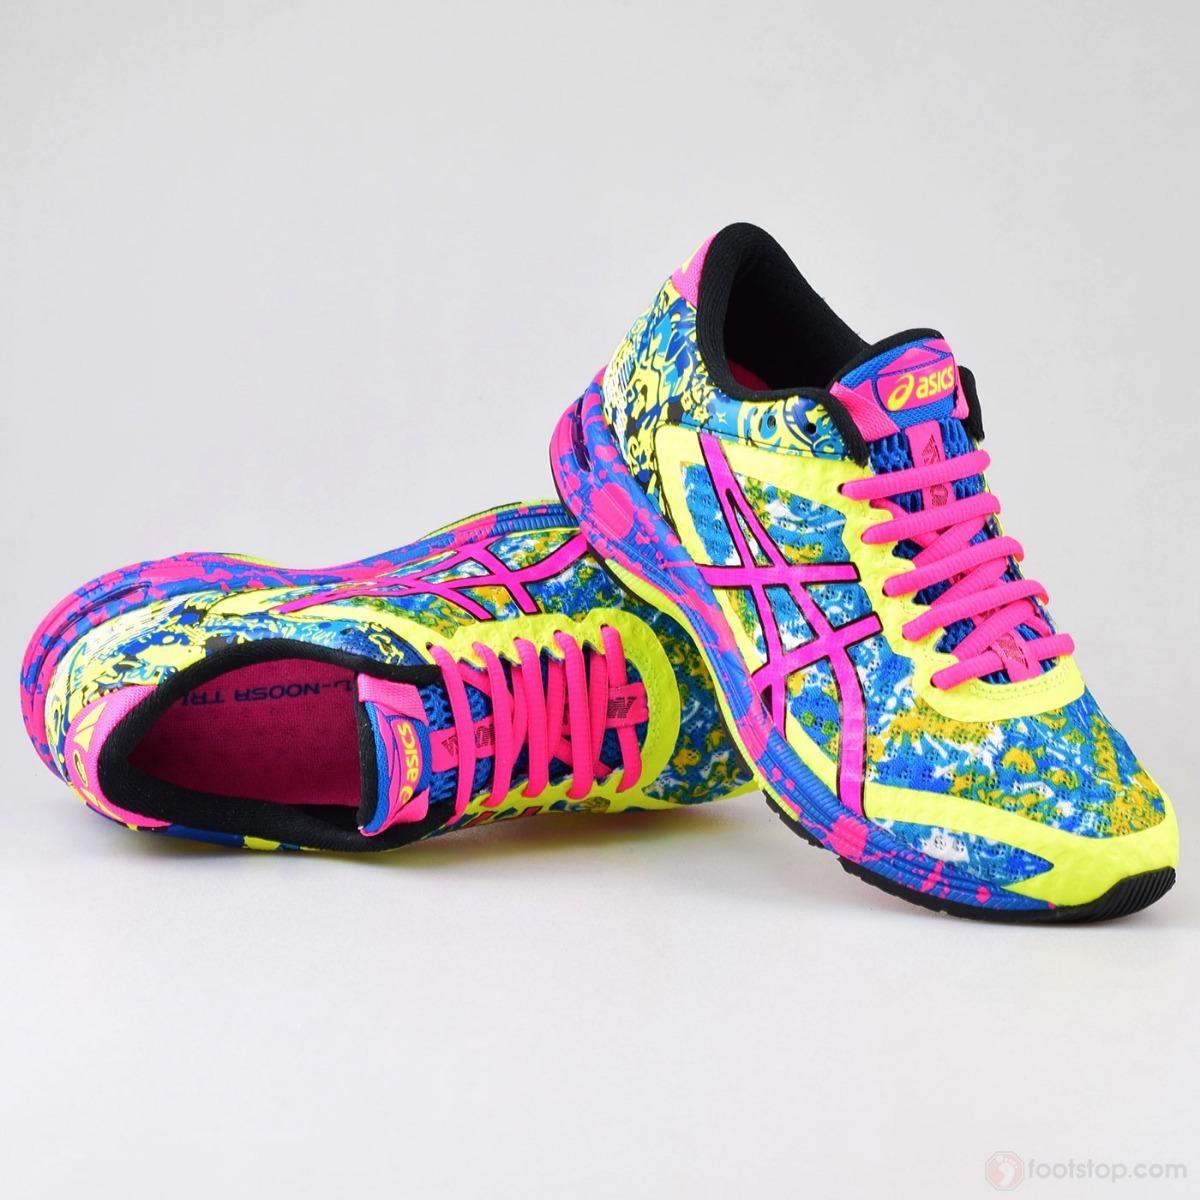 Tenis Mujer Asics Gel Noosa Tri 11 T676n 0720 Running Correr